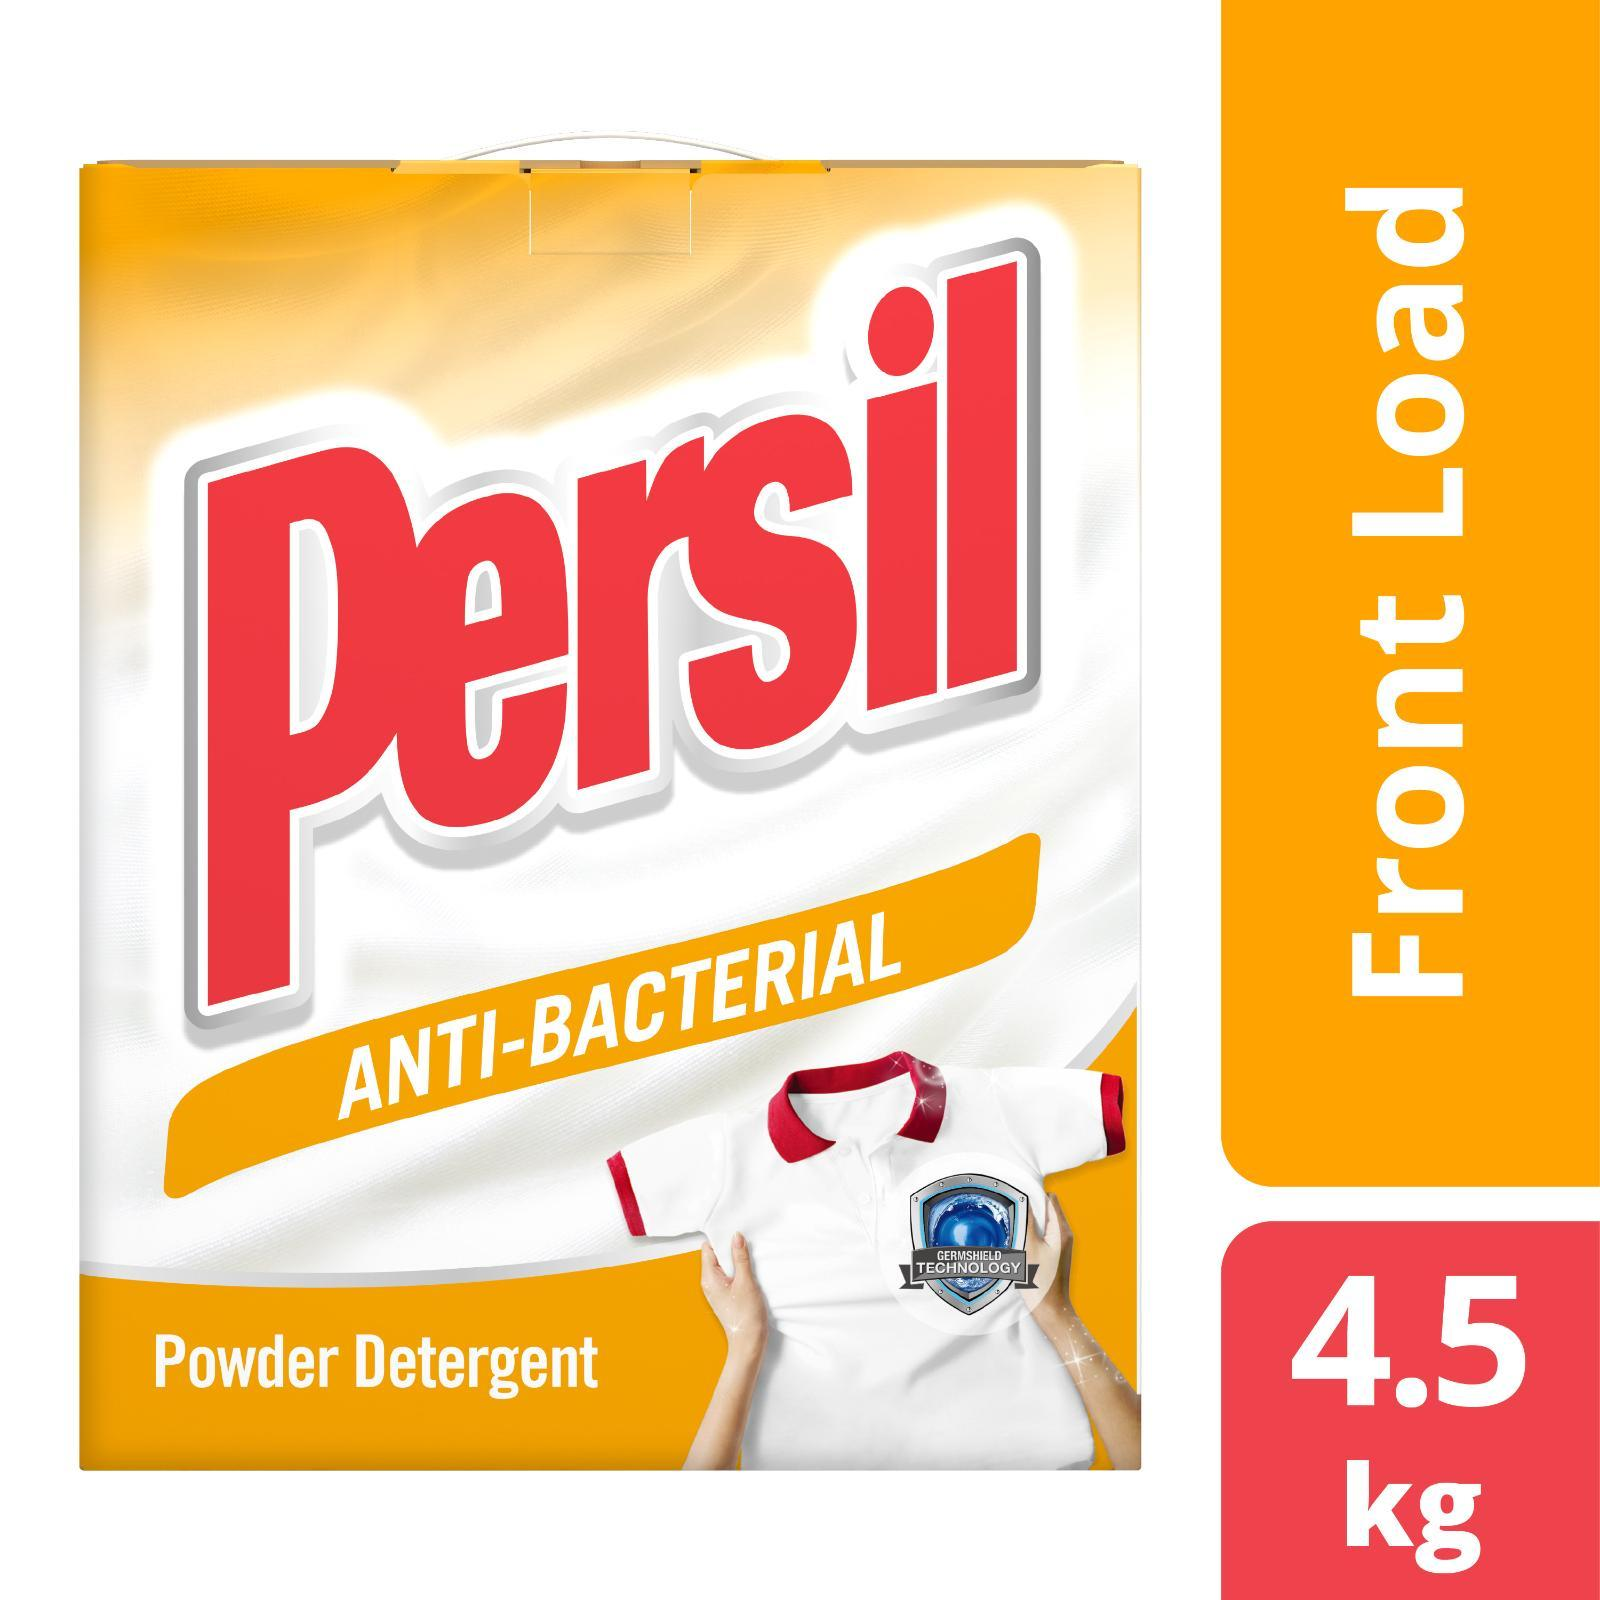 Persil Fibre Intelligent Low Suds Powder Detergent